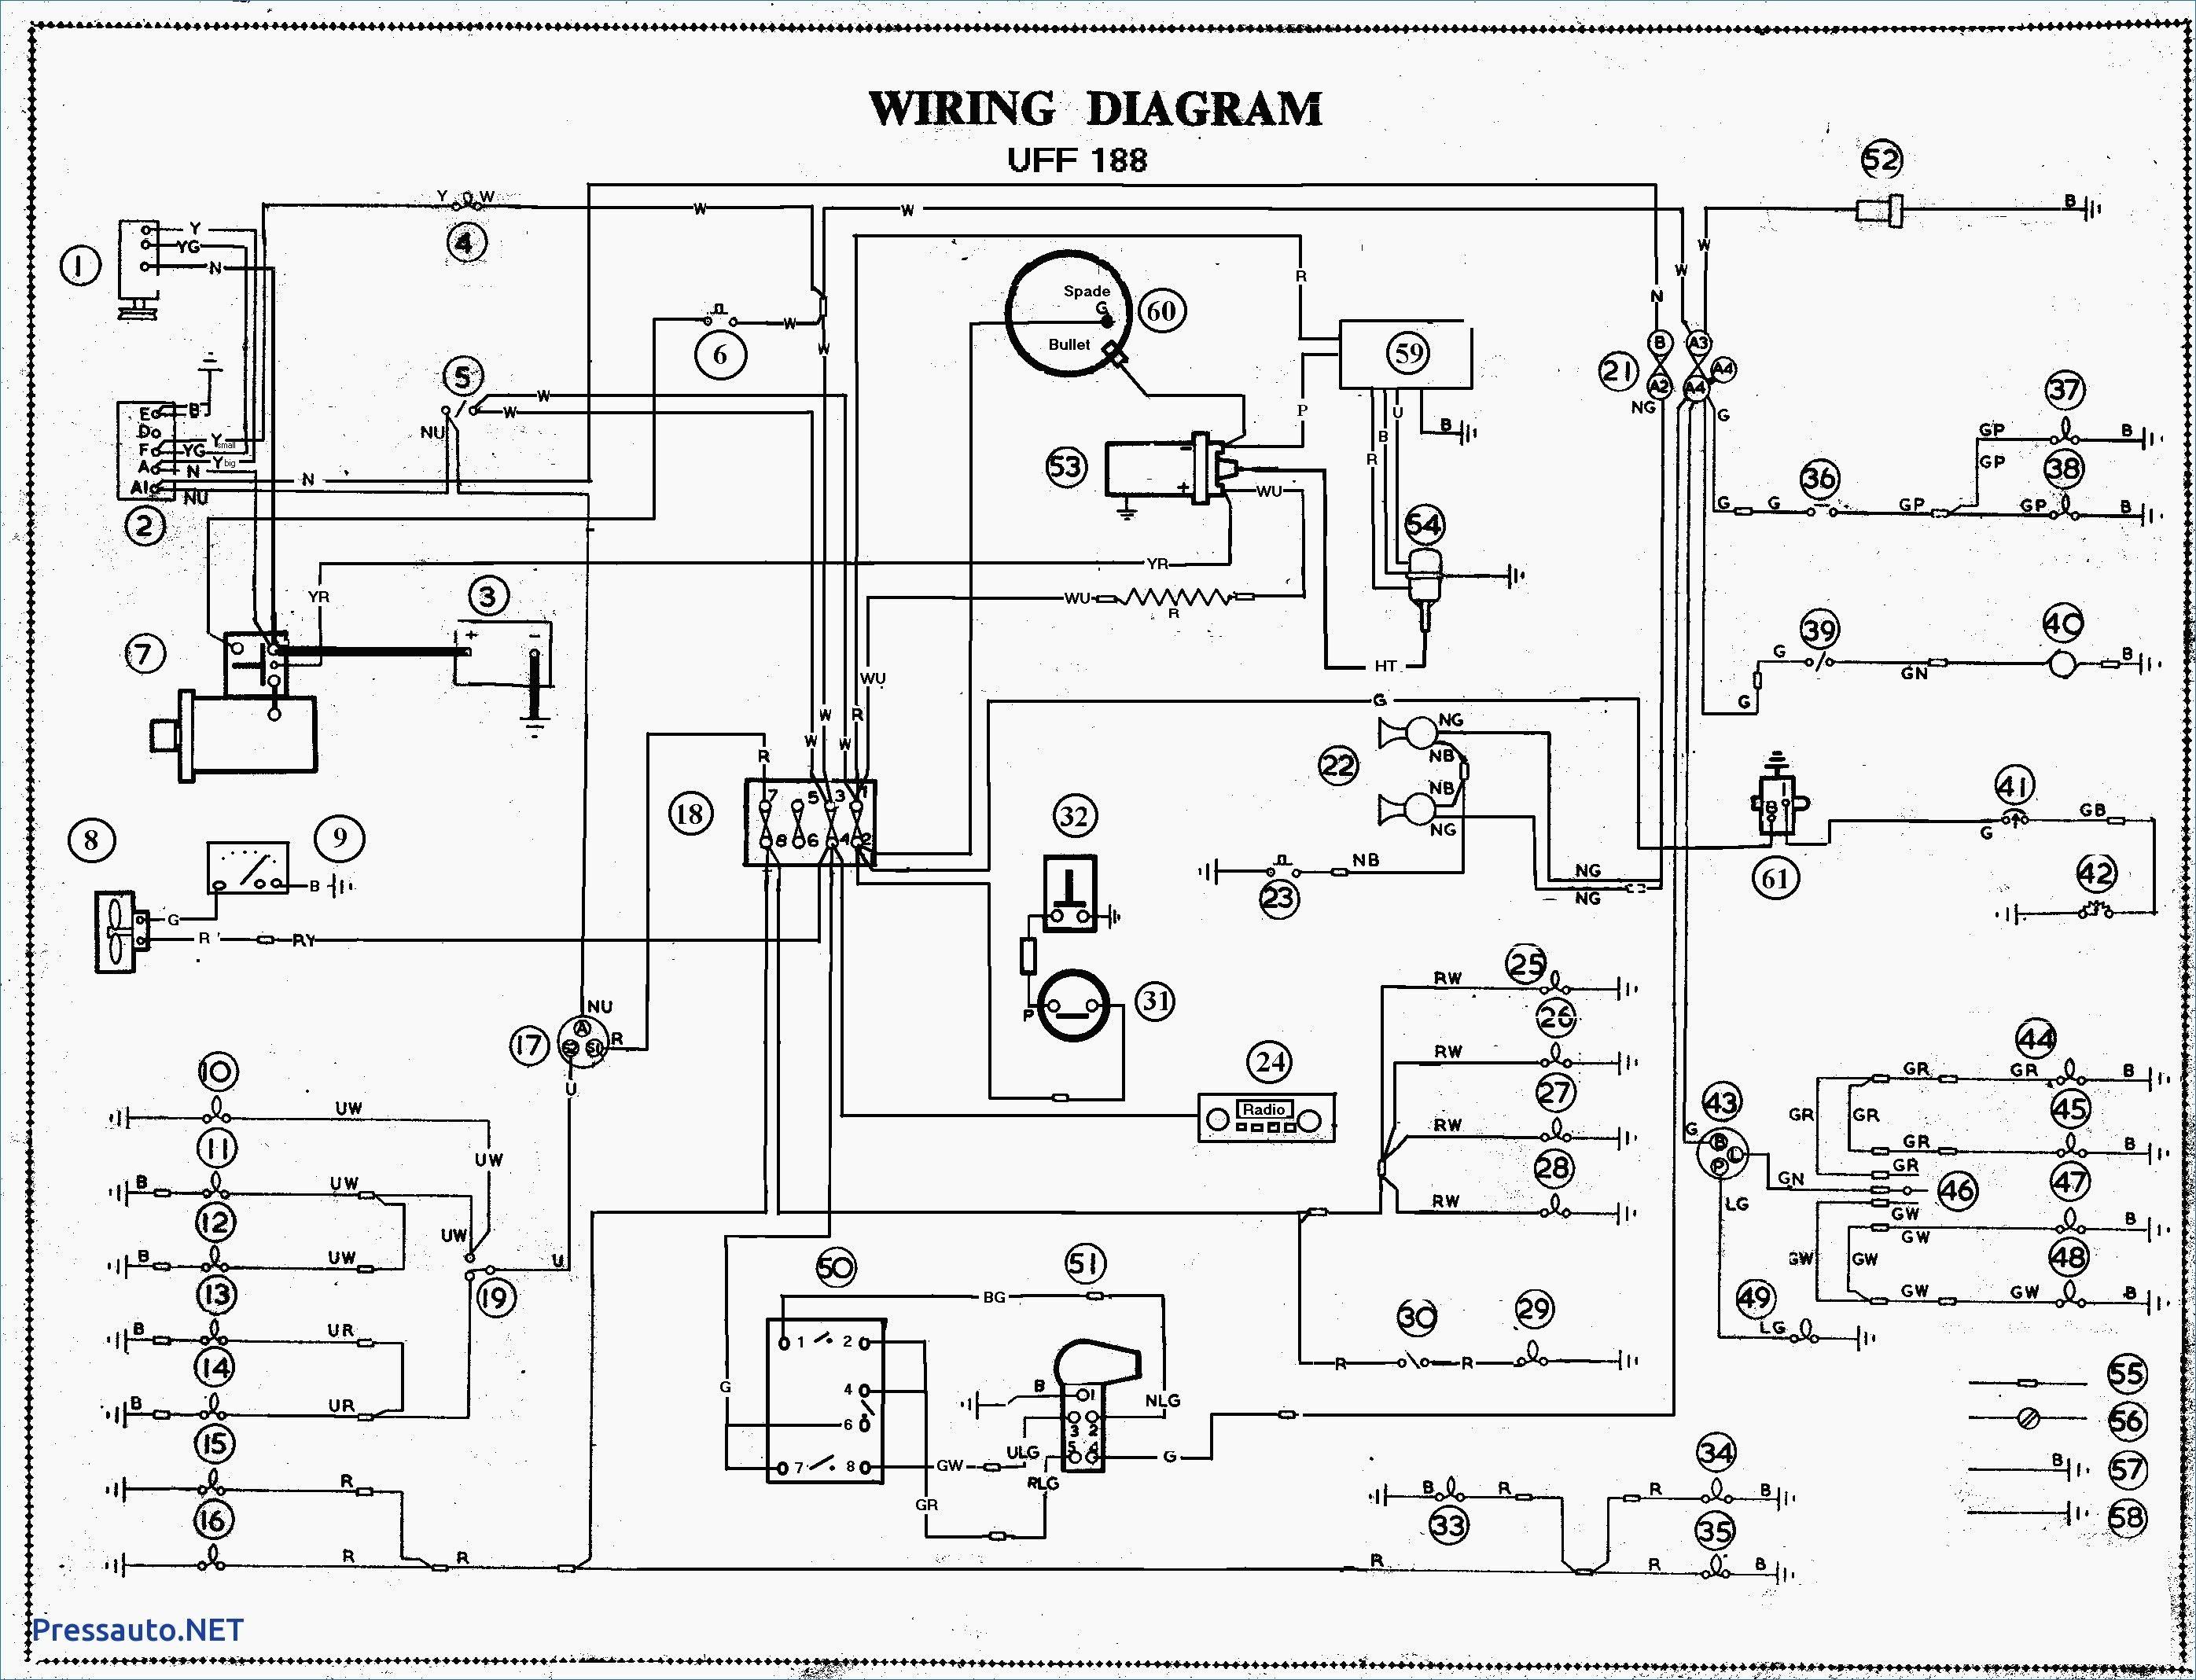 Wiring Diagram Symbols Chart Electrical diagram, Diagram